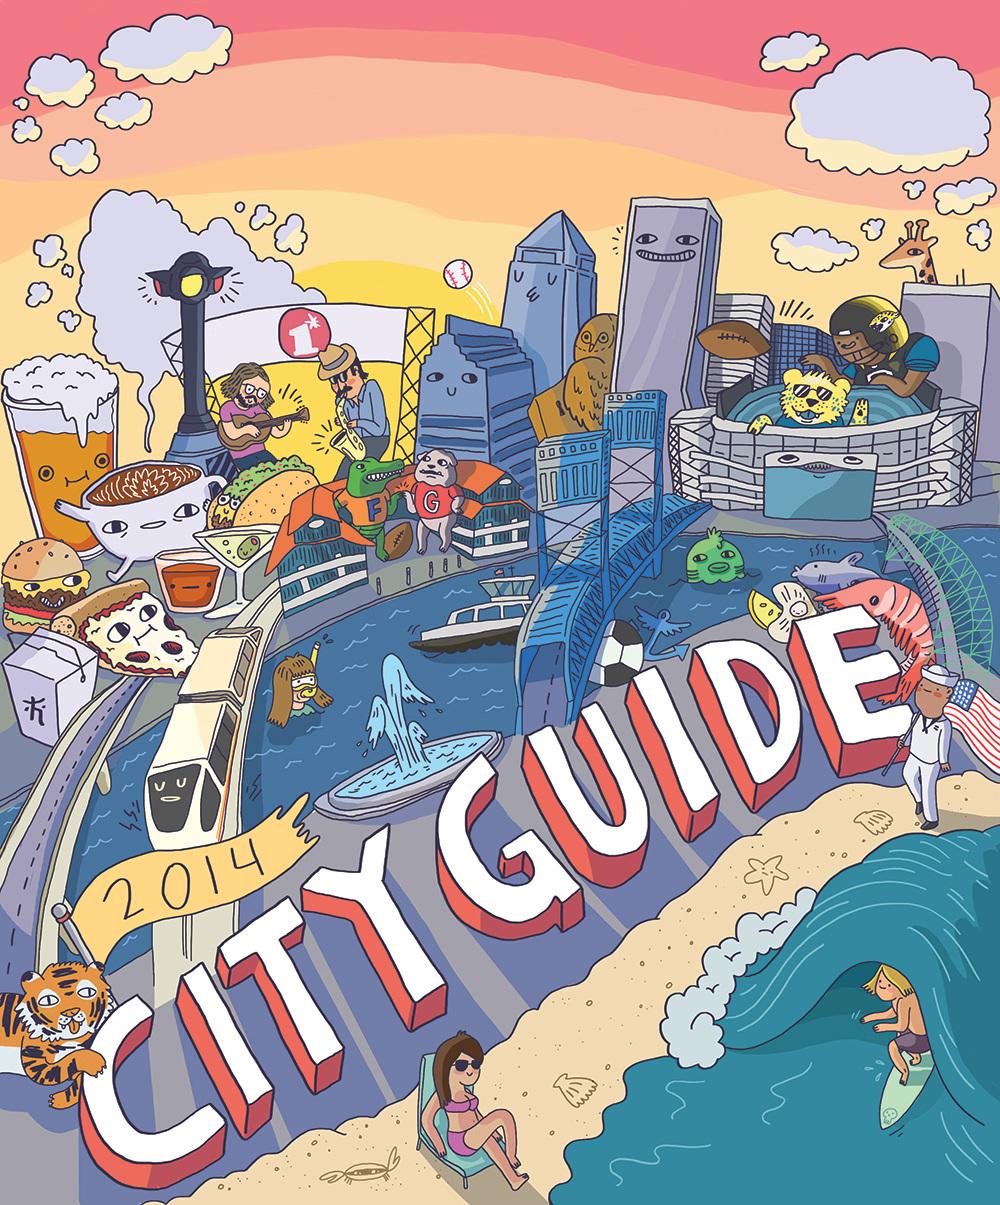 JaxMag-CityGuide-Final-color_1000.jpg